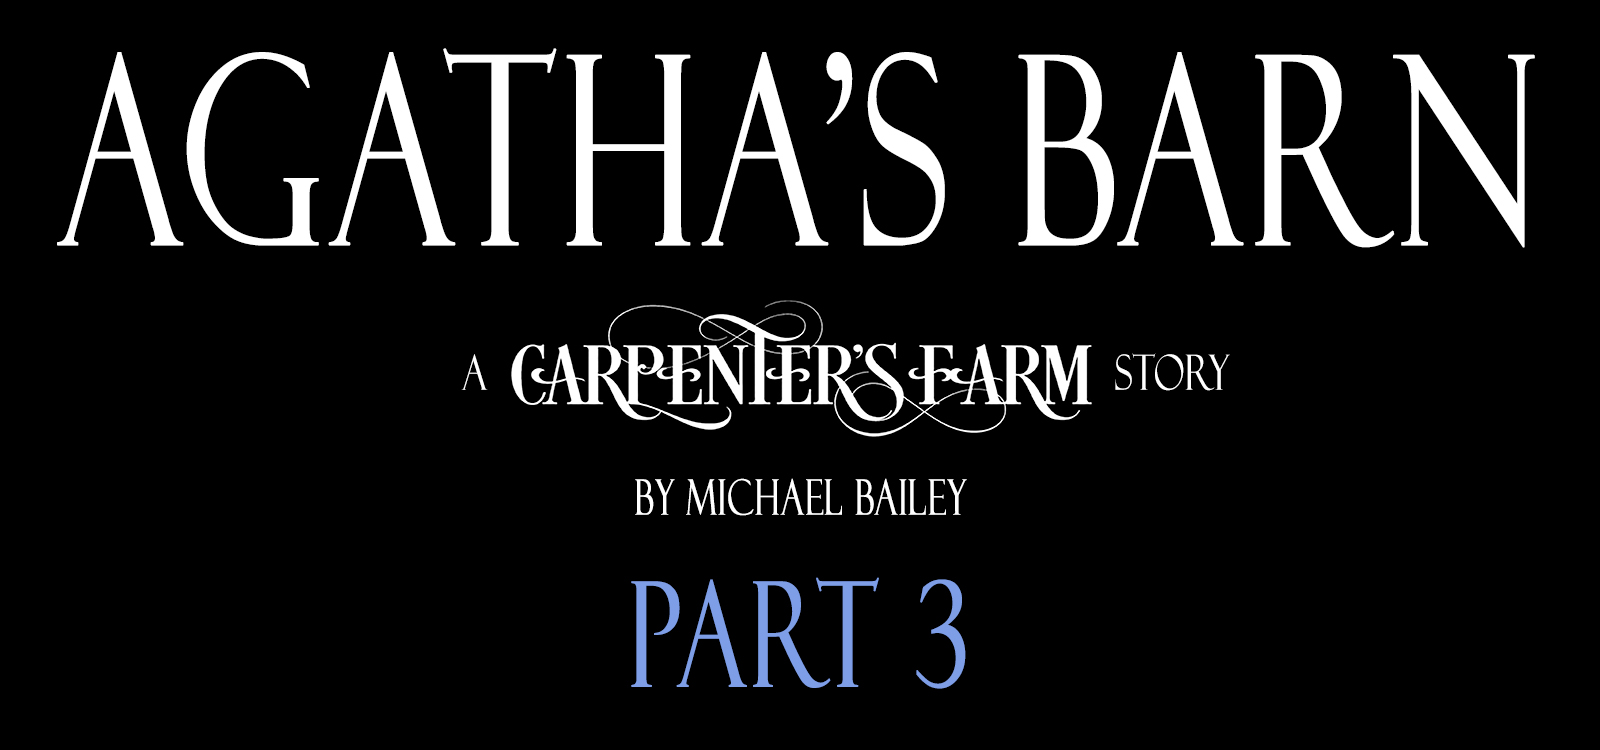 agathas_barn_logo_pt3